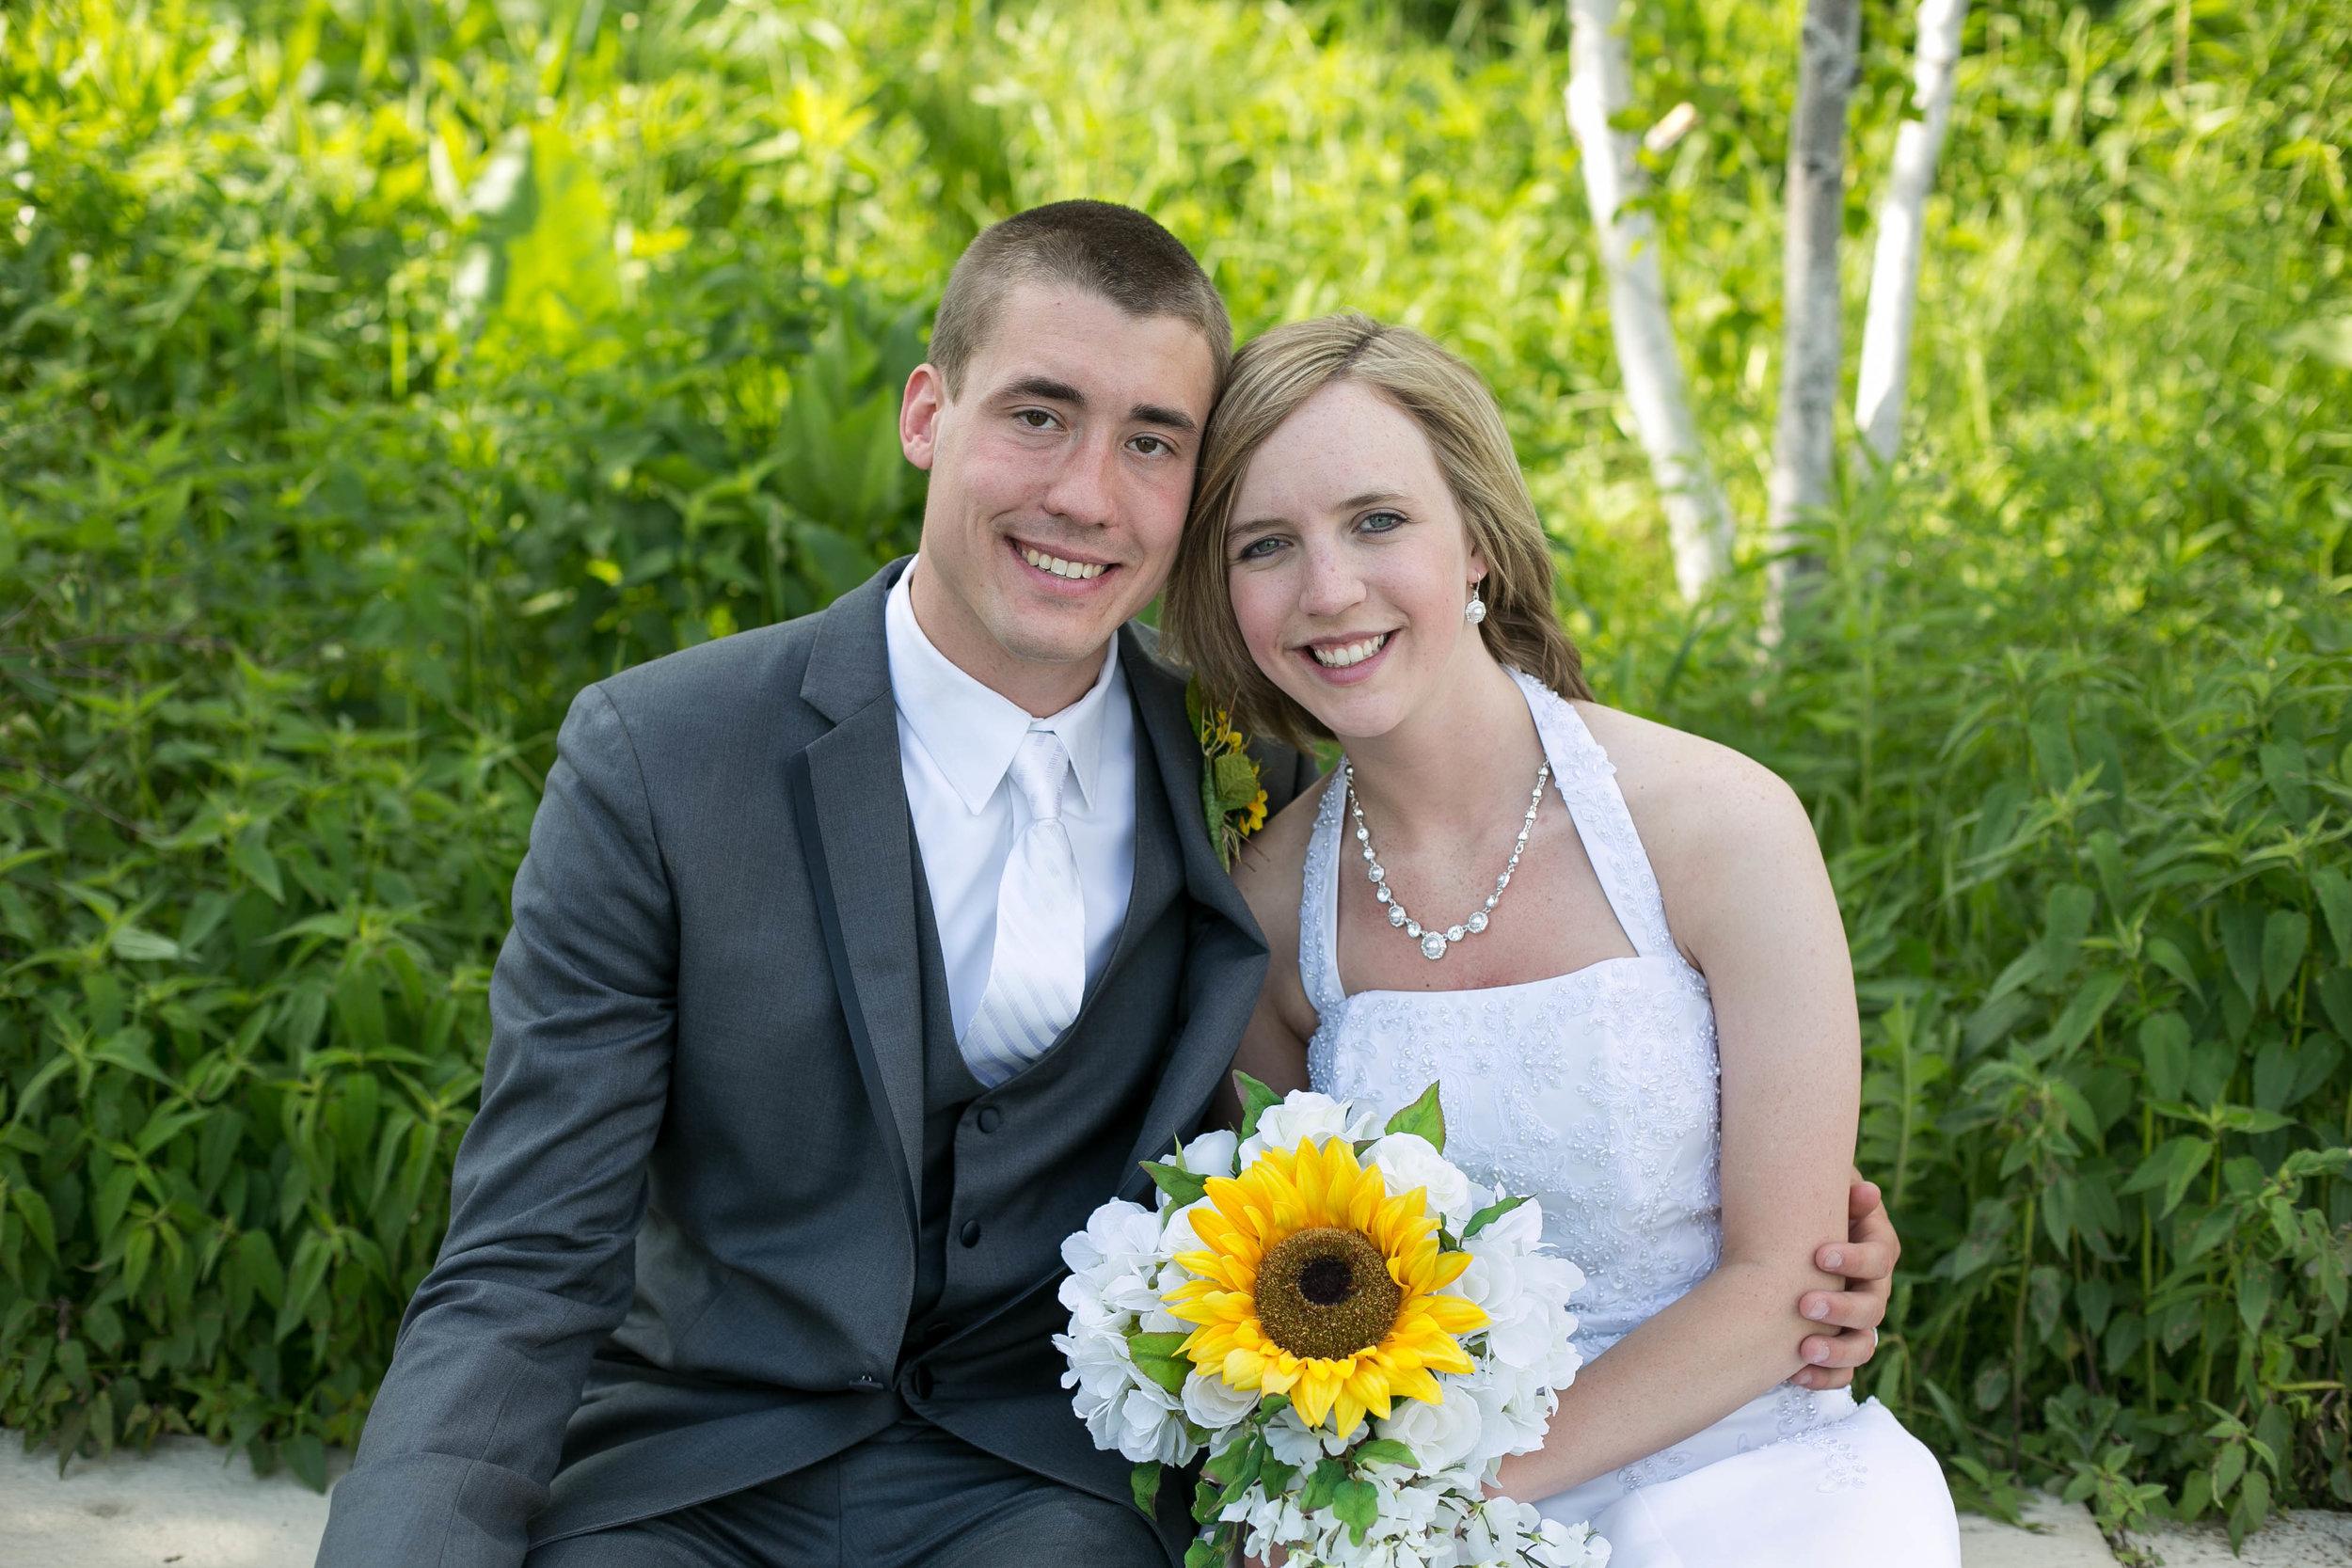 May 23, 2015: Rob and Rachel!